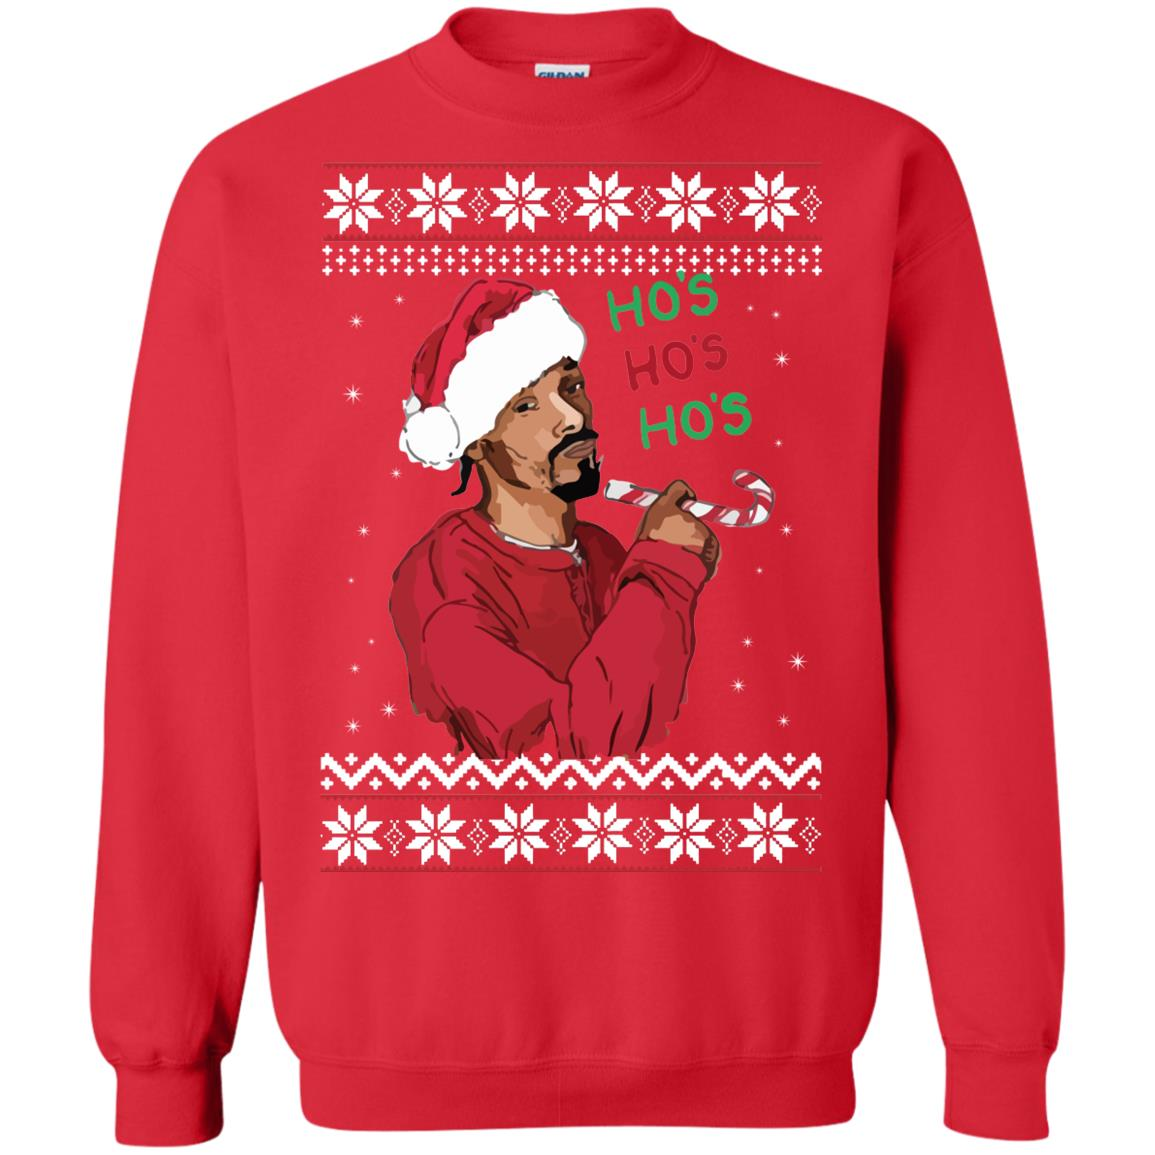 Snoop Dogg Hos Christmas Sweater Shirt Hoodie Long Sleeve